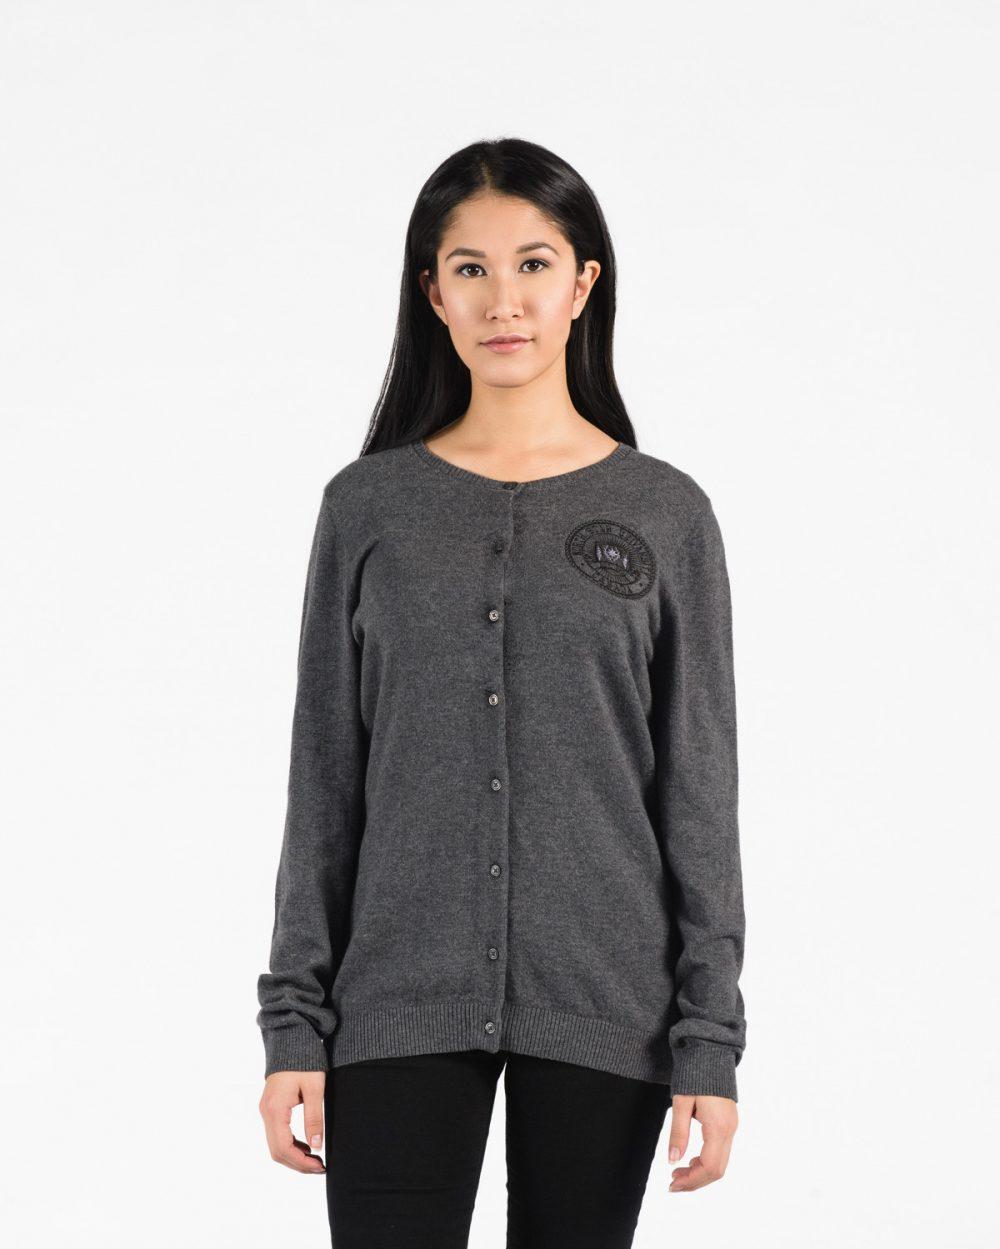 Women's Premium Cardigan 117 in grey.